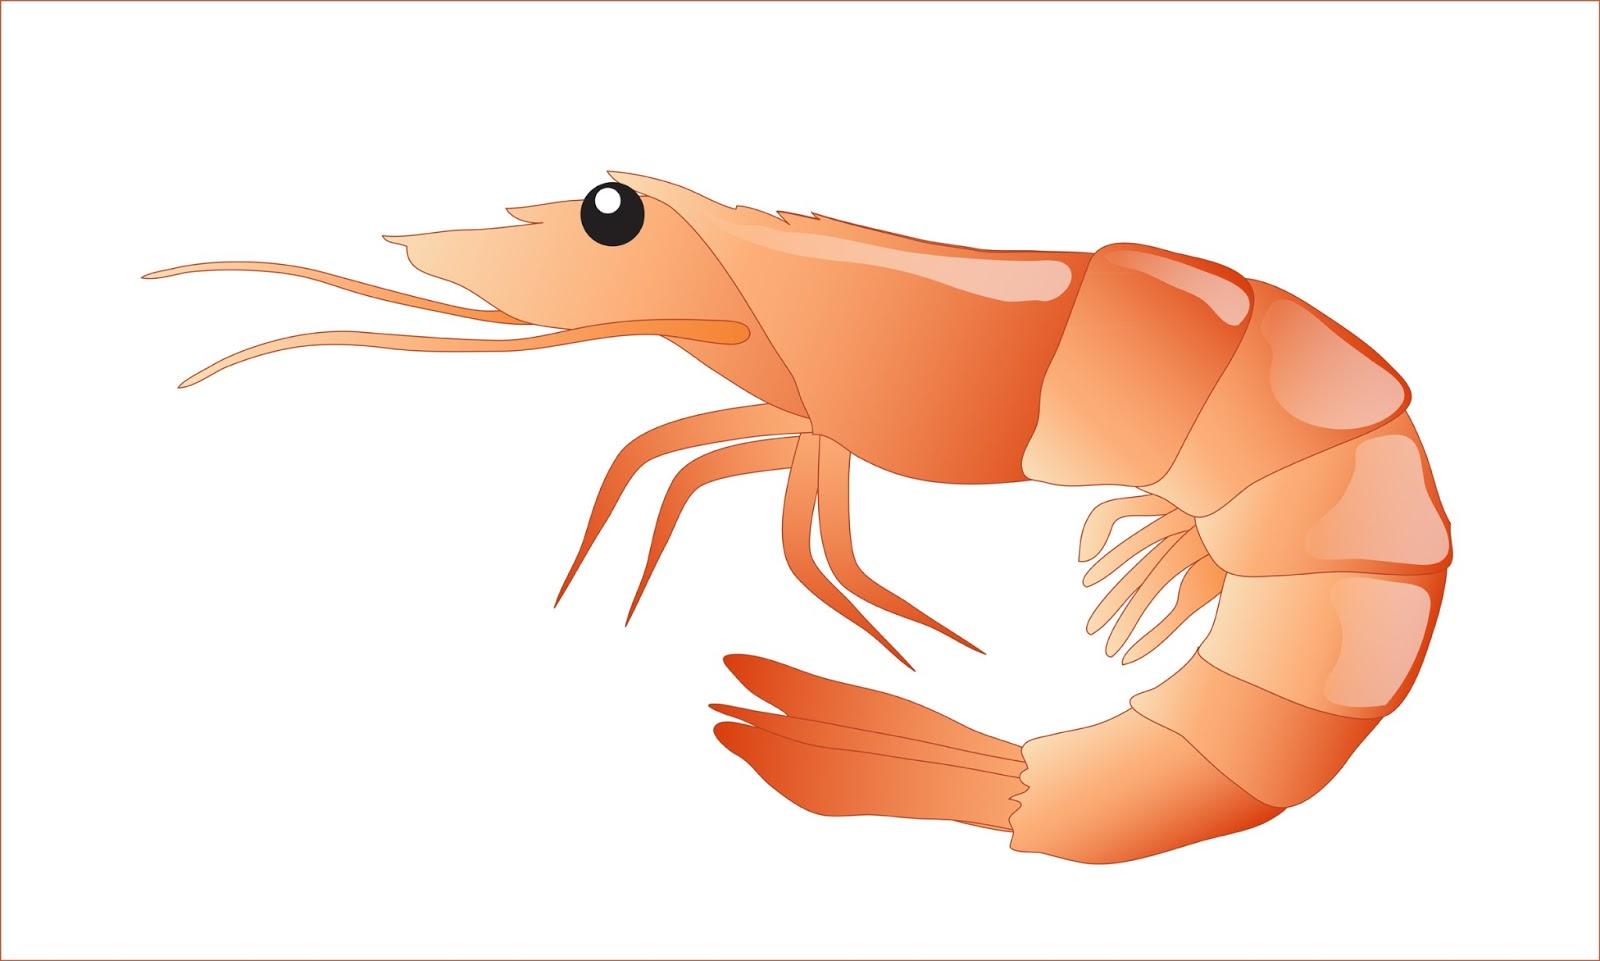 Shrimp clip art tumundografico